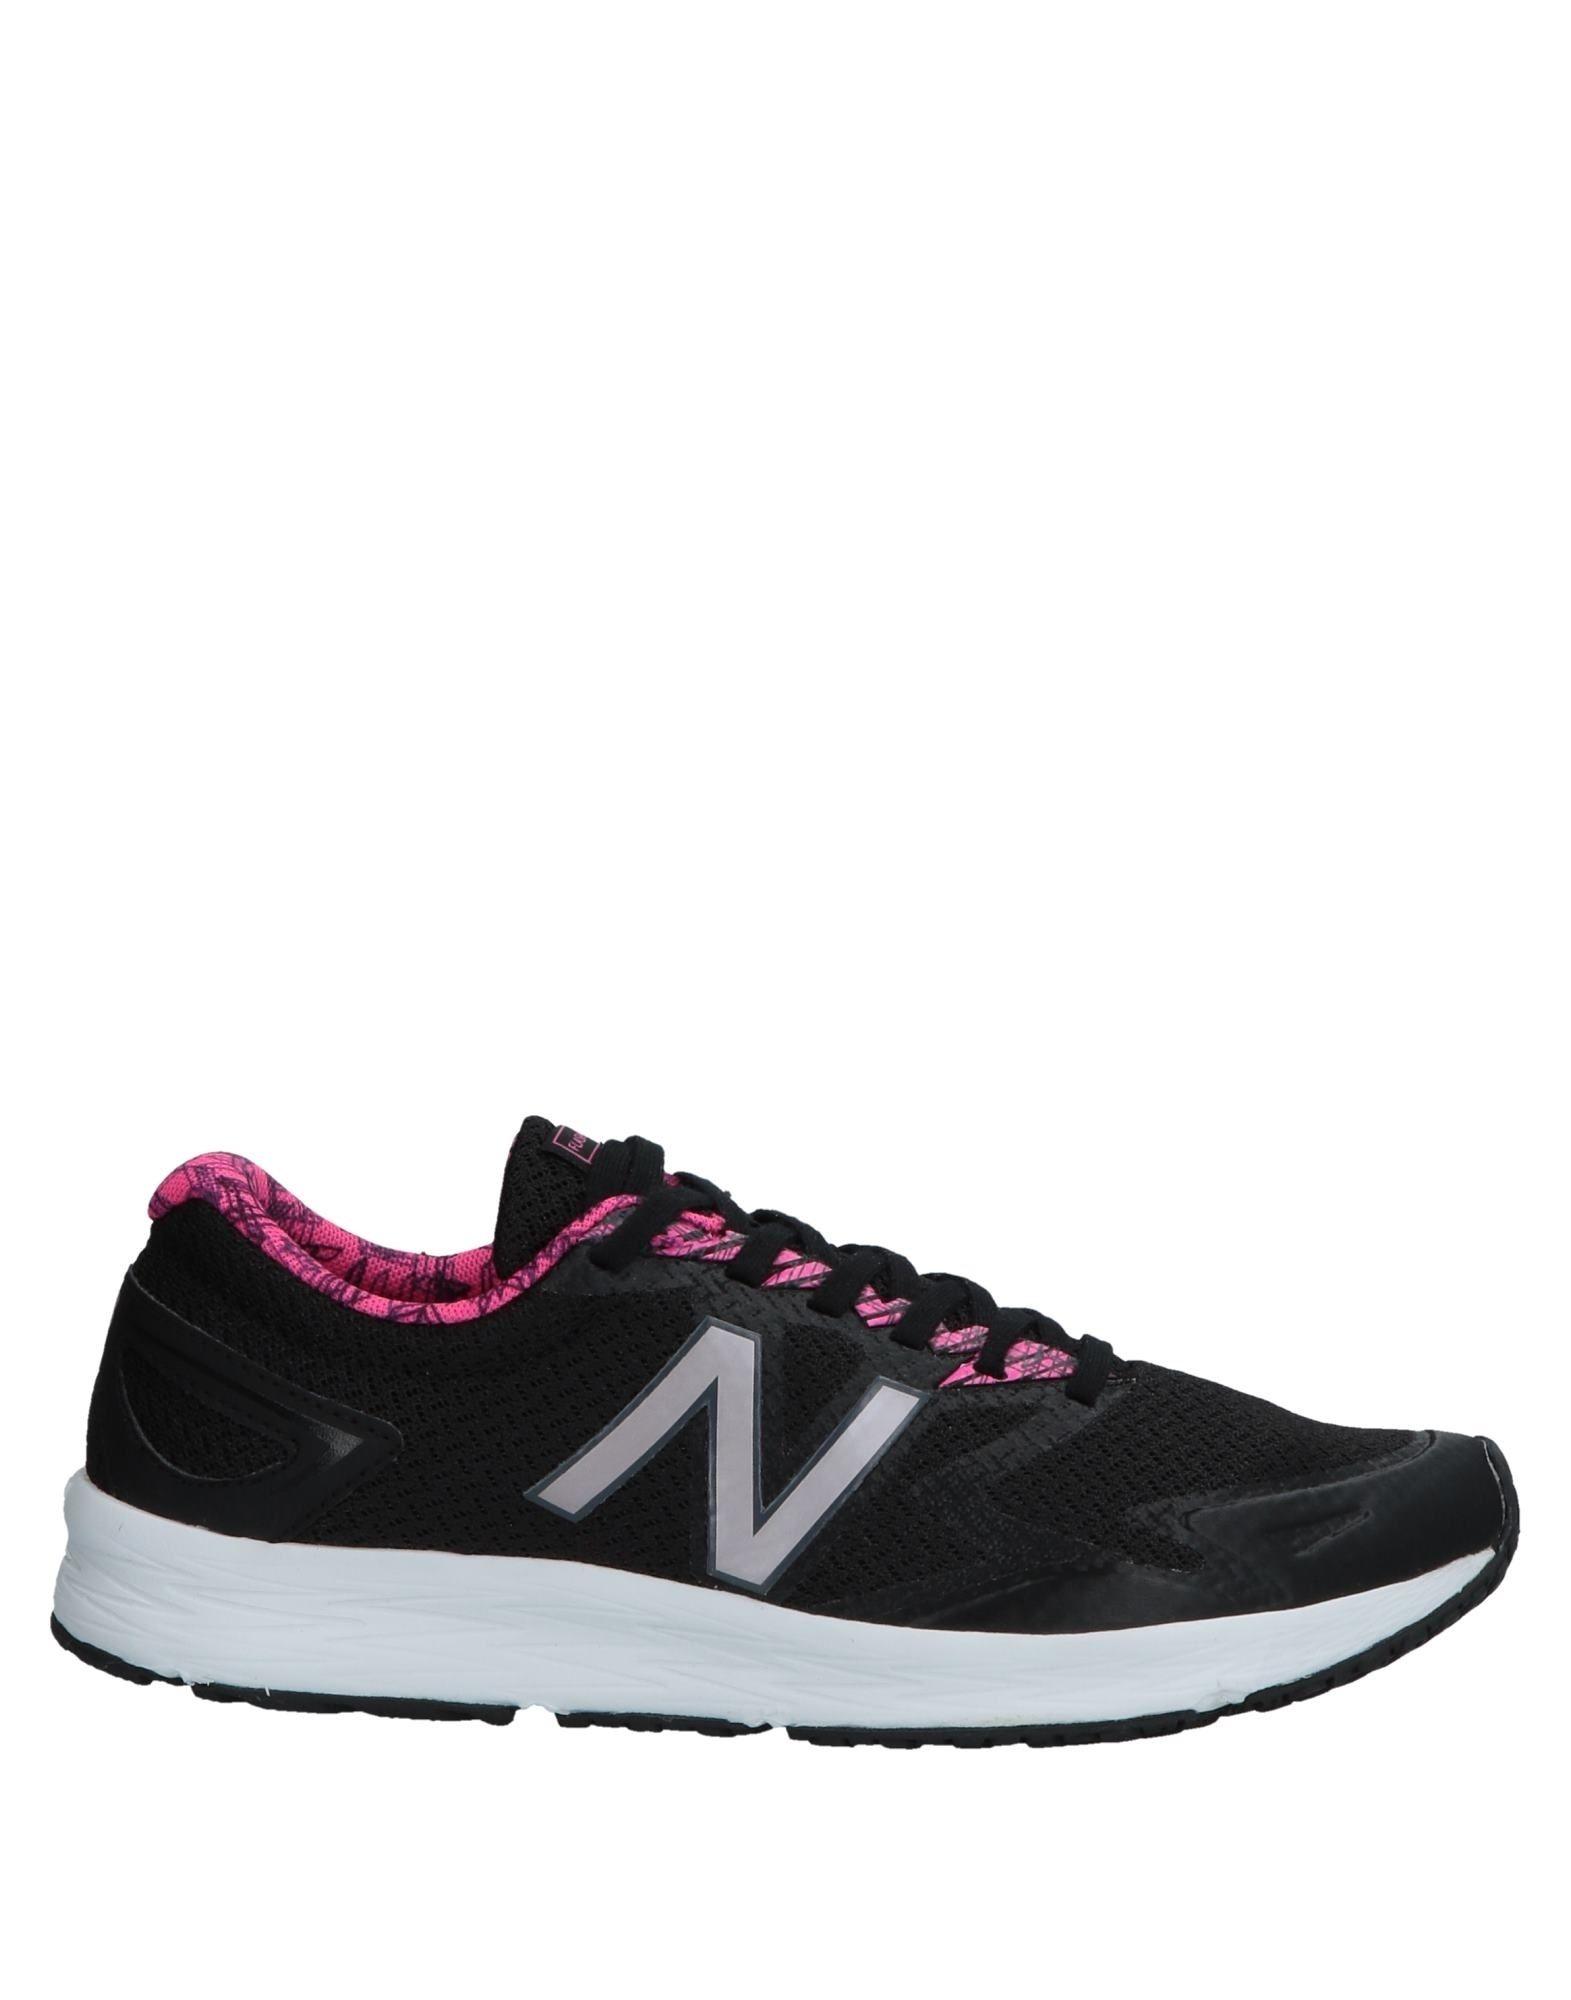 Baskets New Balance Femme - Confortable Baskets New Balance Noir Confortable - et belle 378a6f